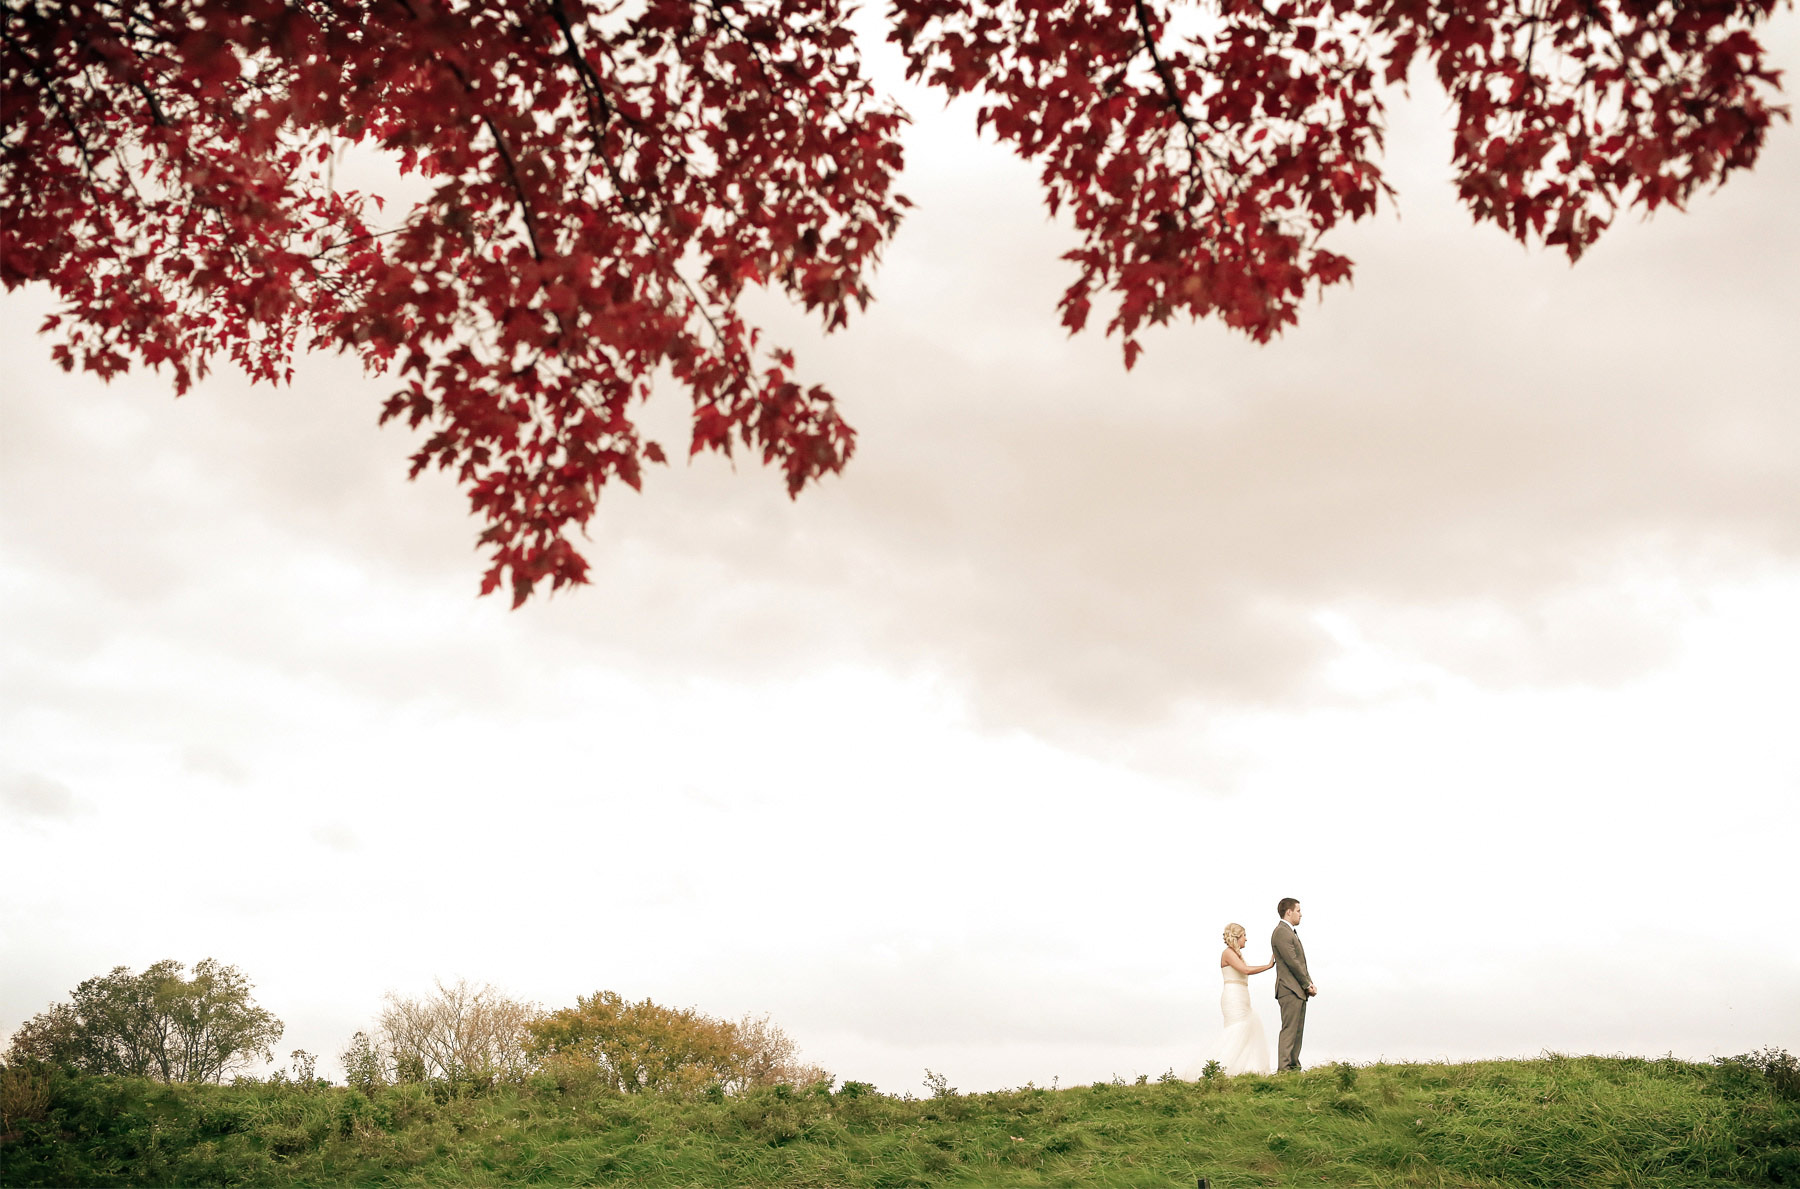 05-Stillwater-Minnesota-Wedding-Photographer-by-Andrew-Vick-Photography-Fall-Autumn-StoneRidge-Golf-Club-First-Meeting-Look-Bride-Groom-Hills-Field-Vintage-Micaela-and-Derek.jpg